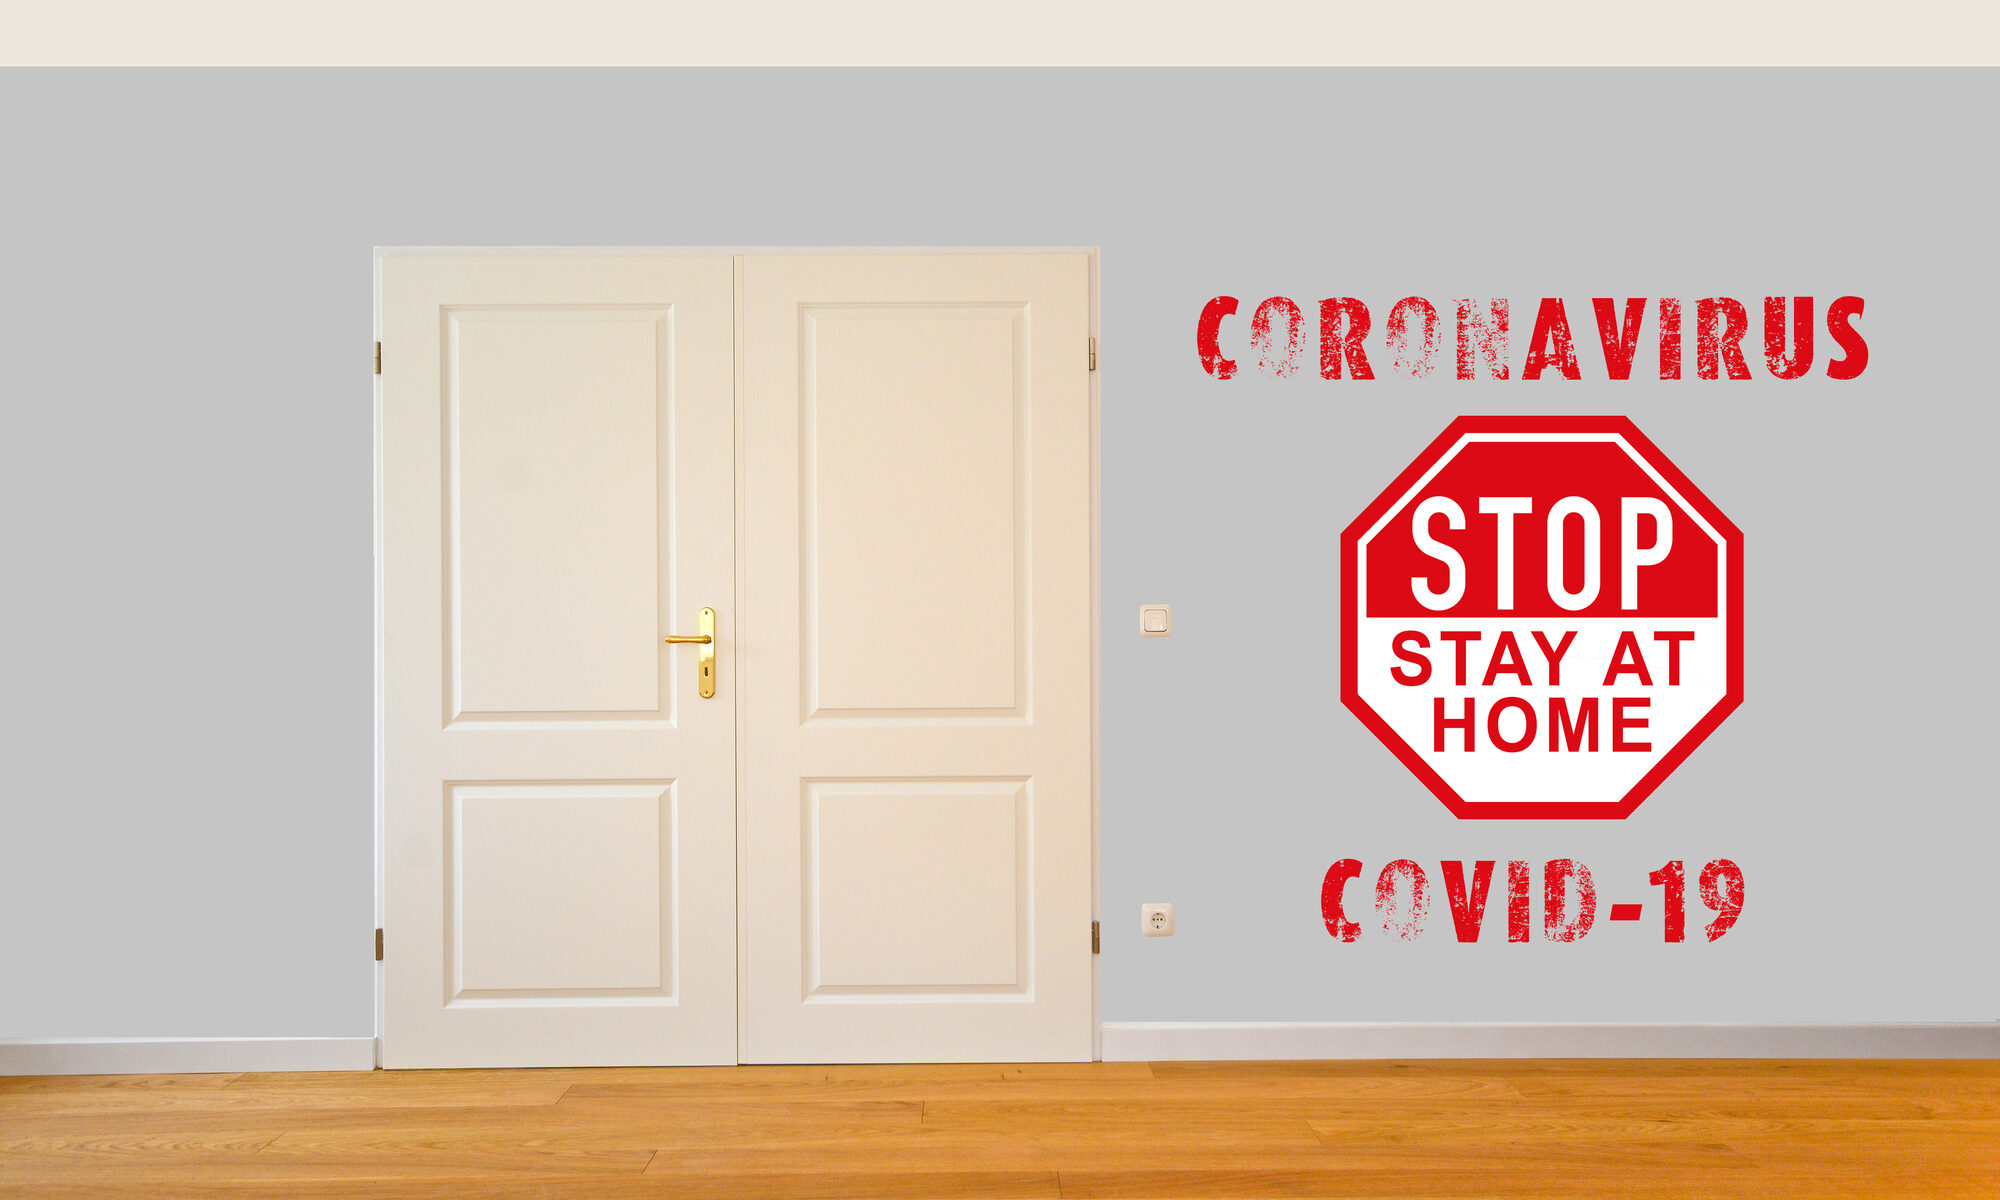 Stopschild mit Corona Schriftzug